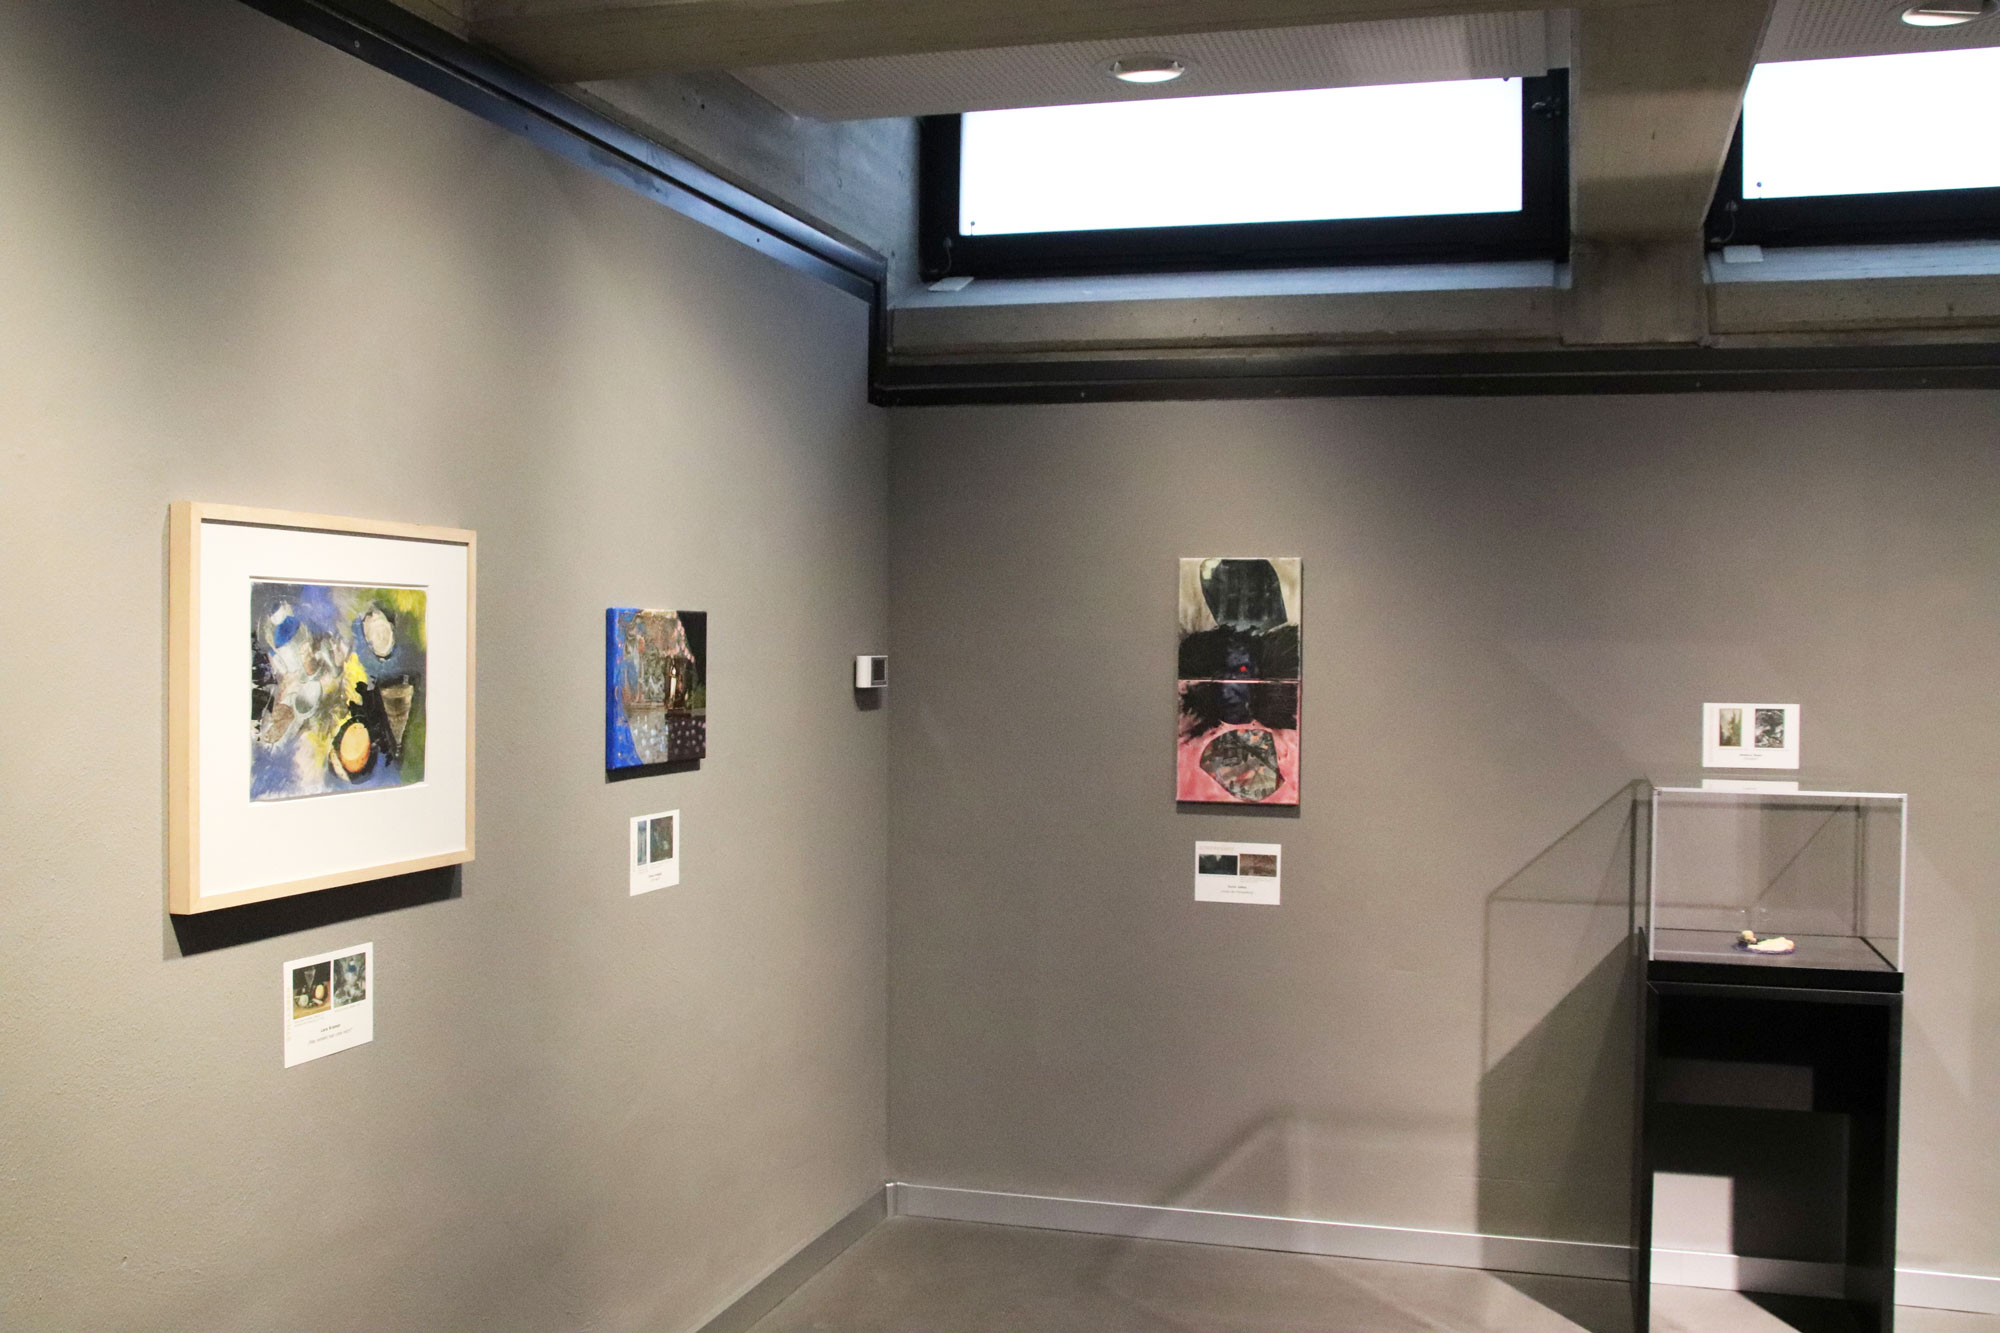 Kreative Begegnungen im Clemens Sels Museum. (Foto: Stadt Neuss)